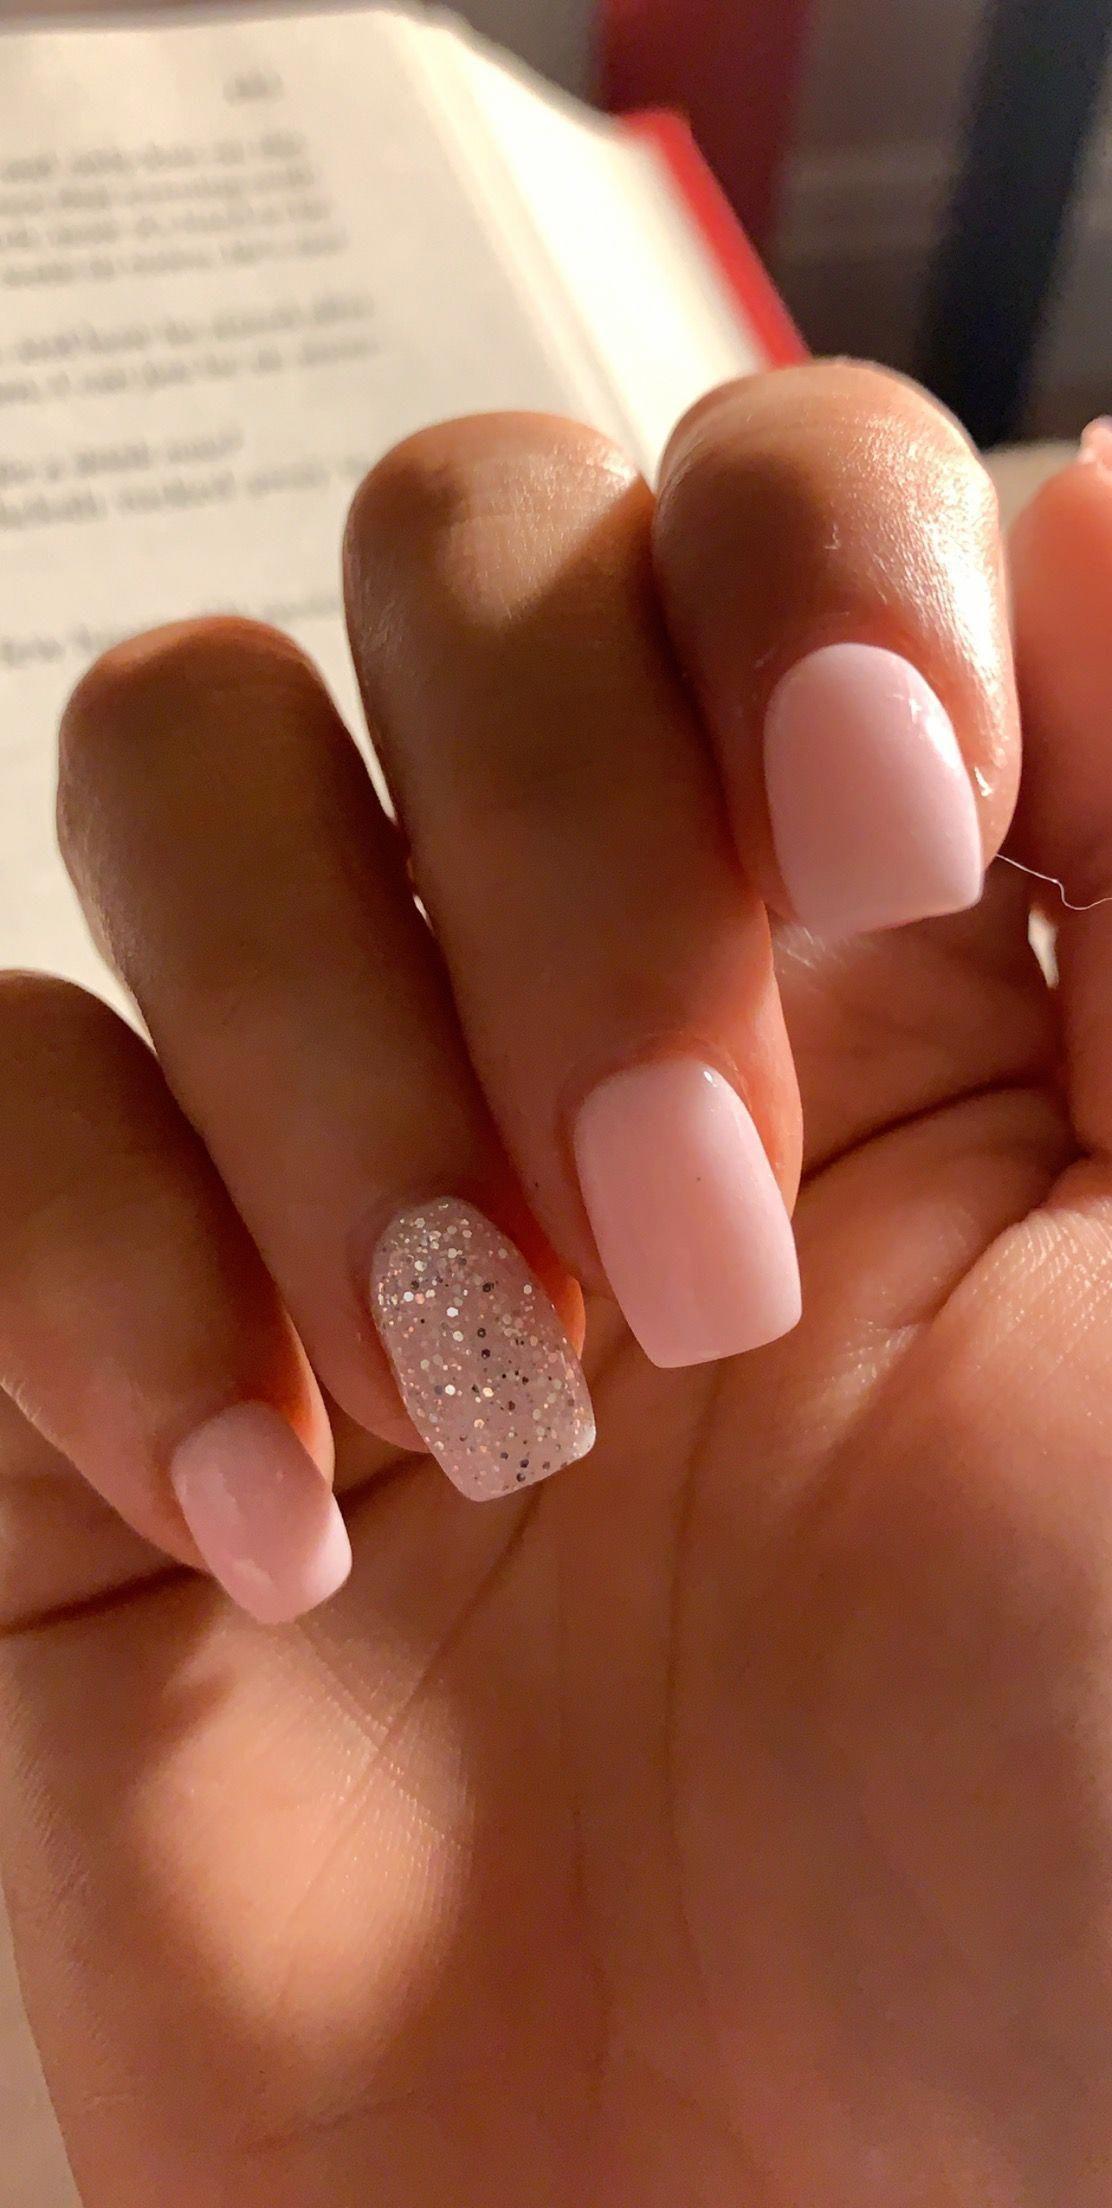 Pink Powder Acrylic Nails Pink Powder Acrylic Nails In 2020 Short Acrylic Nails Designs Acrylic Nails Coffin Short Short Acrylic Nails